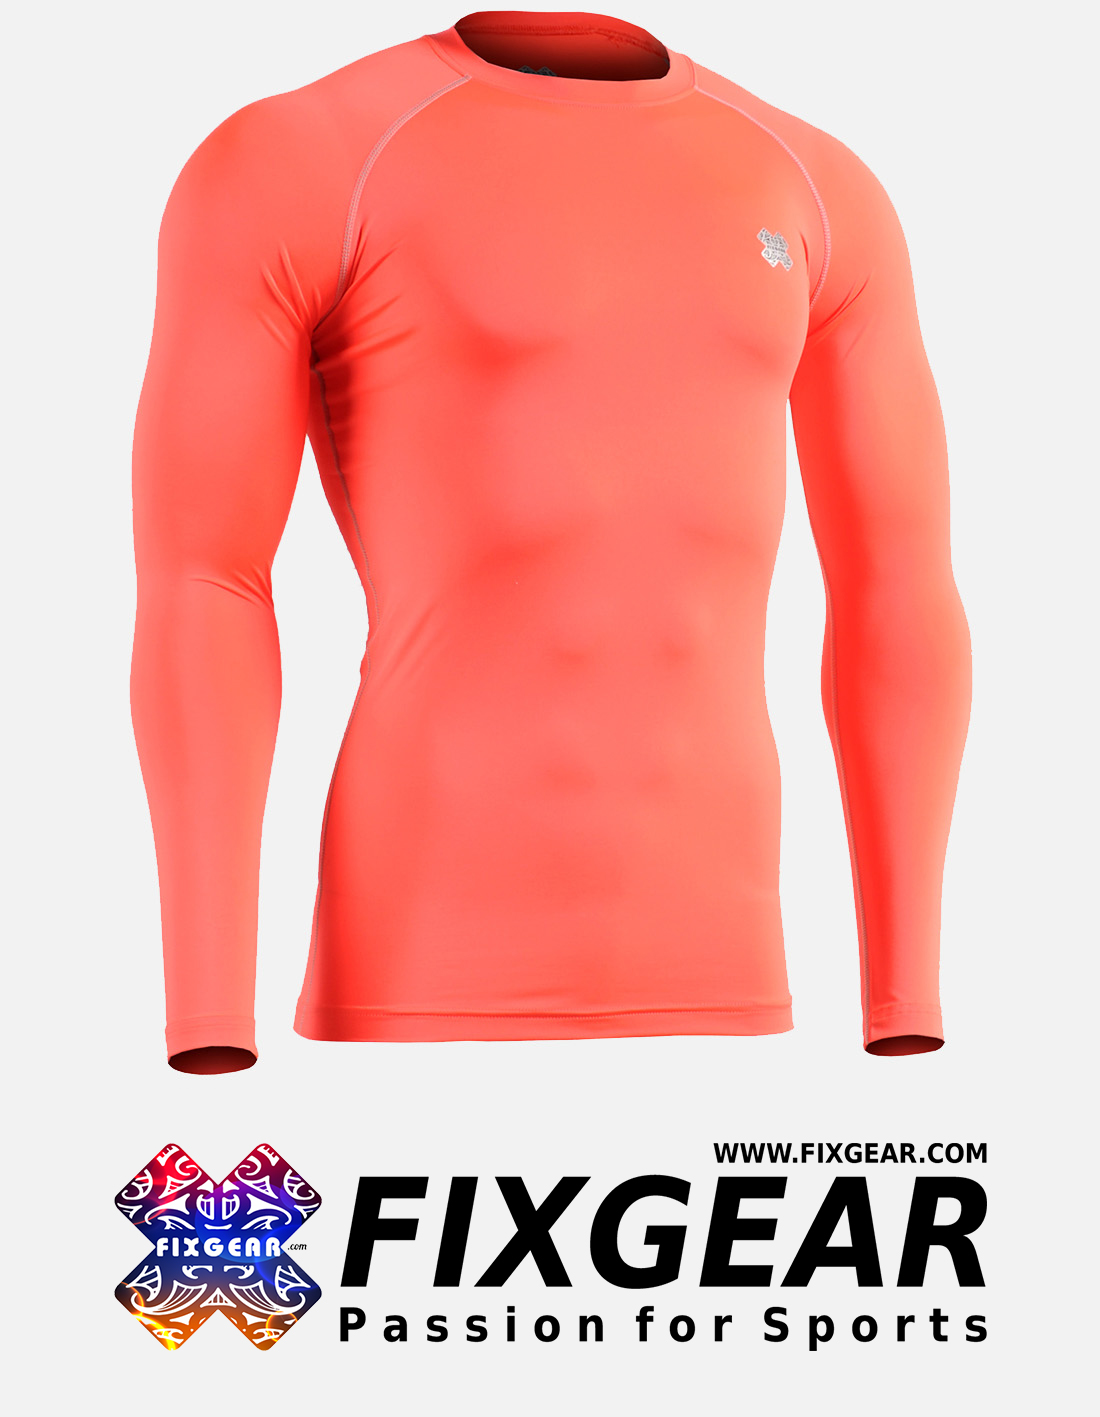 FIXGEAR CPL-RO Skin-tight Compression Base Layer Shirt